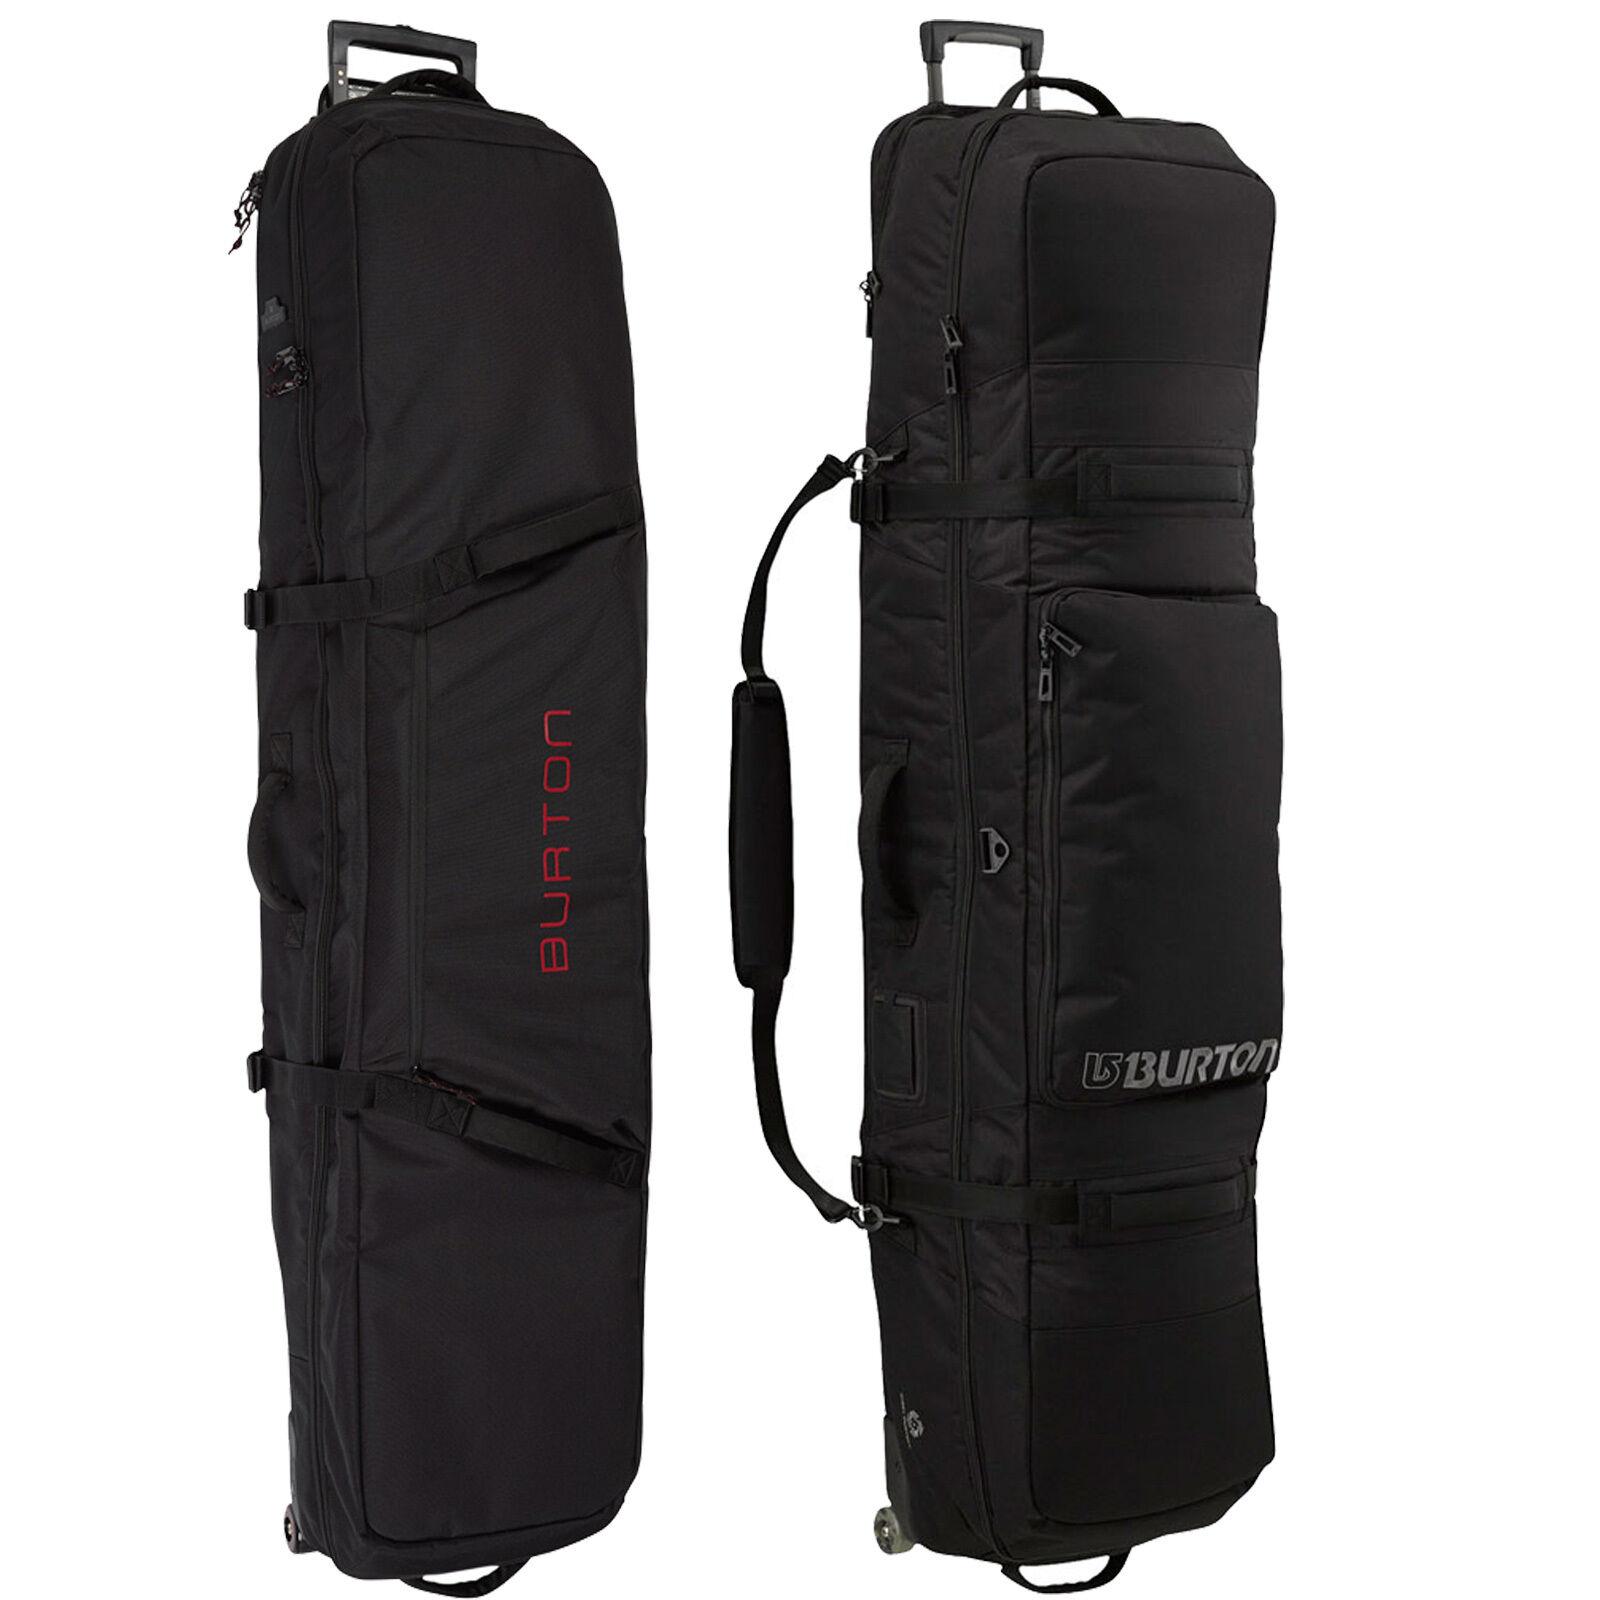 Burton Wheelie Whistle Snowboard Bag Rolling Bag Carrying Bag